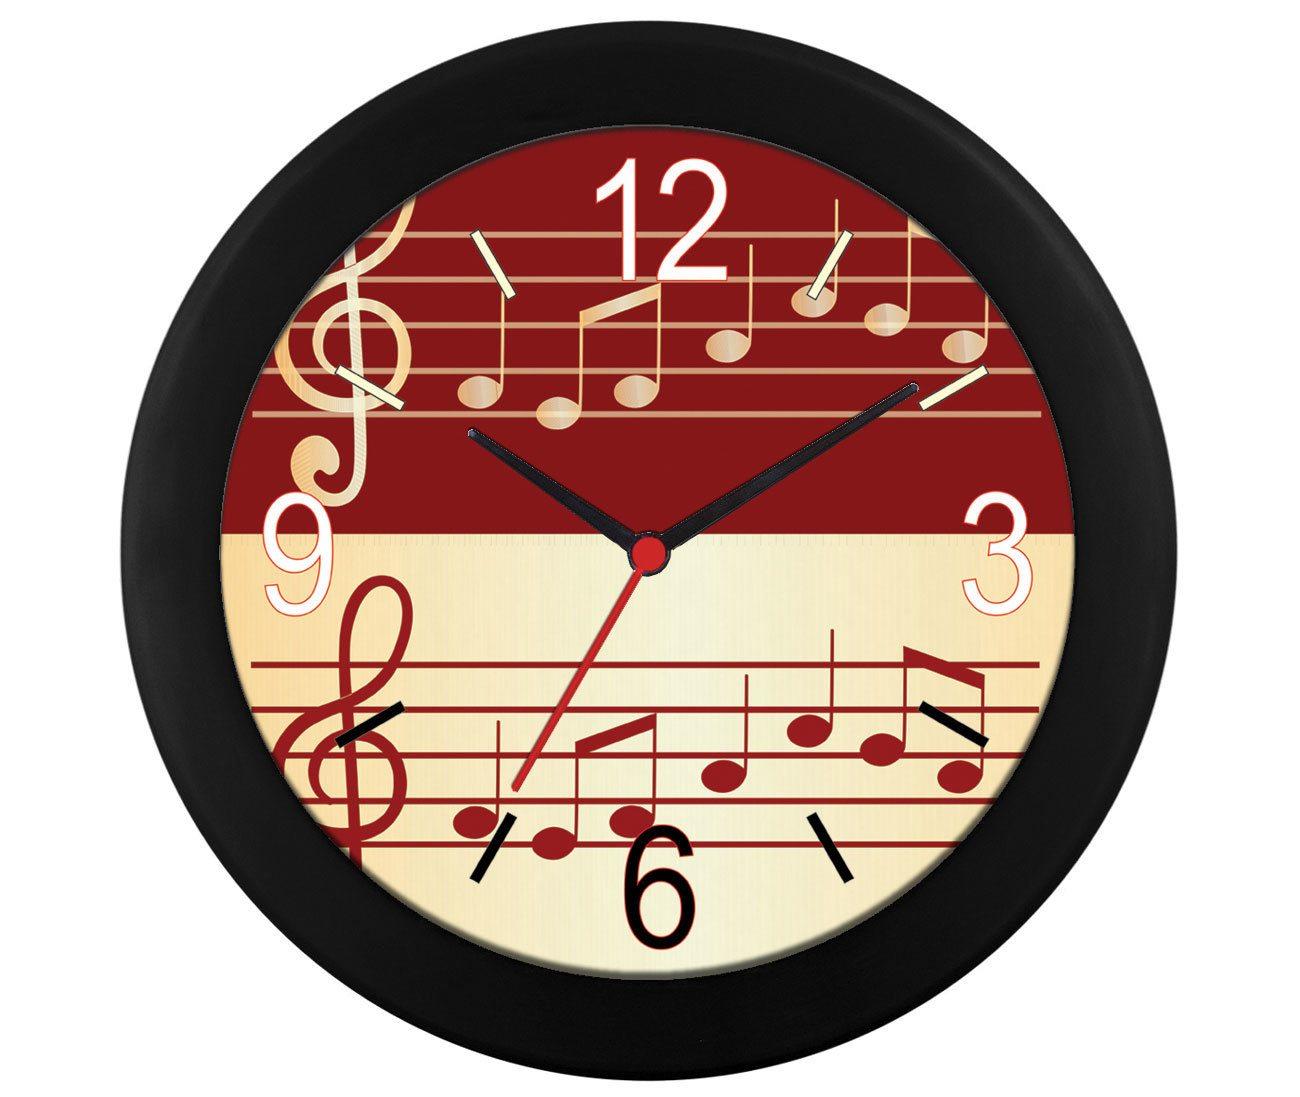 Relógio de parede Pauta musical